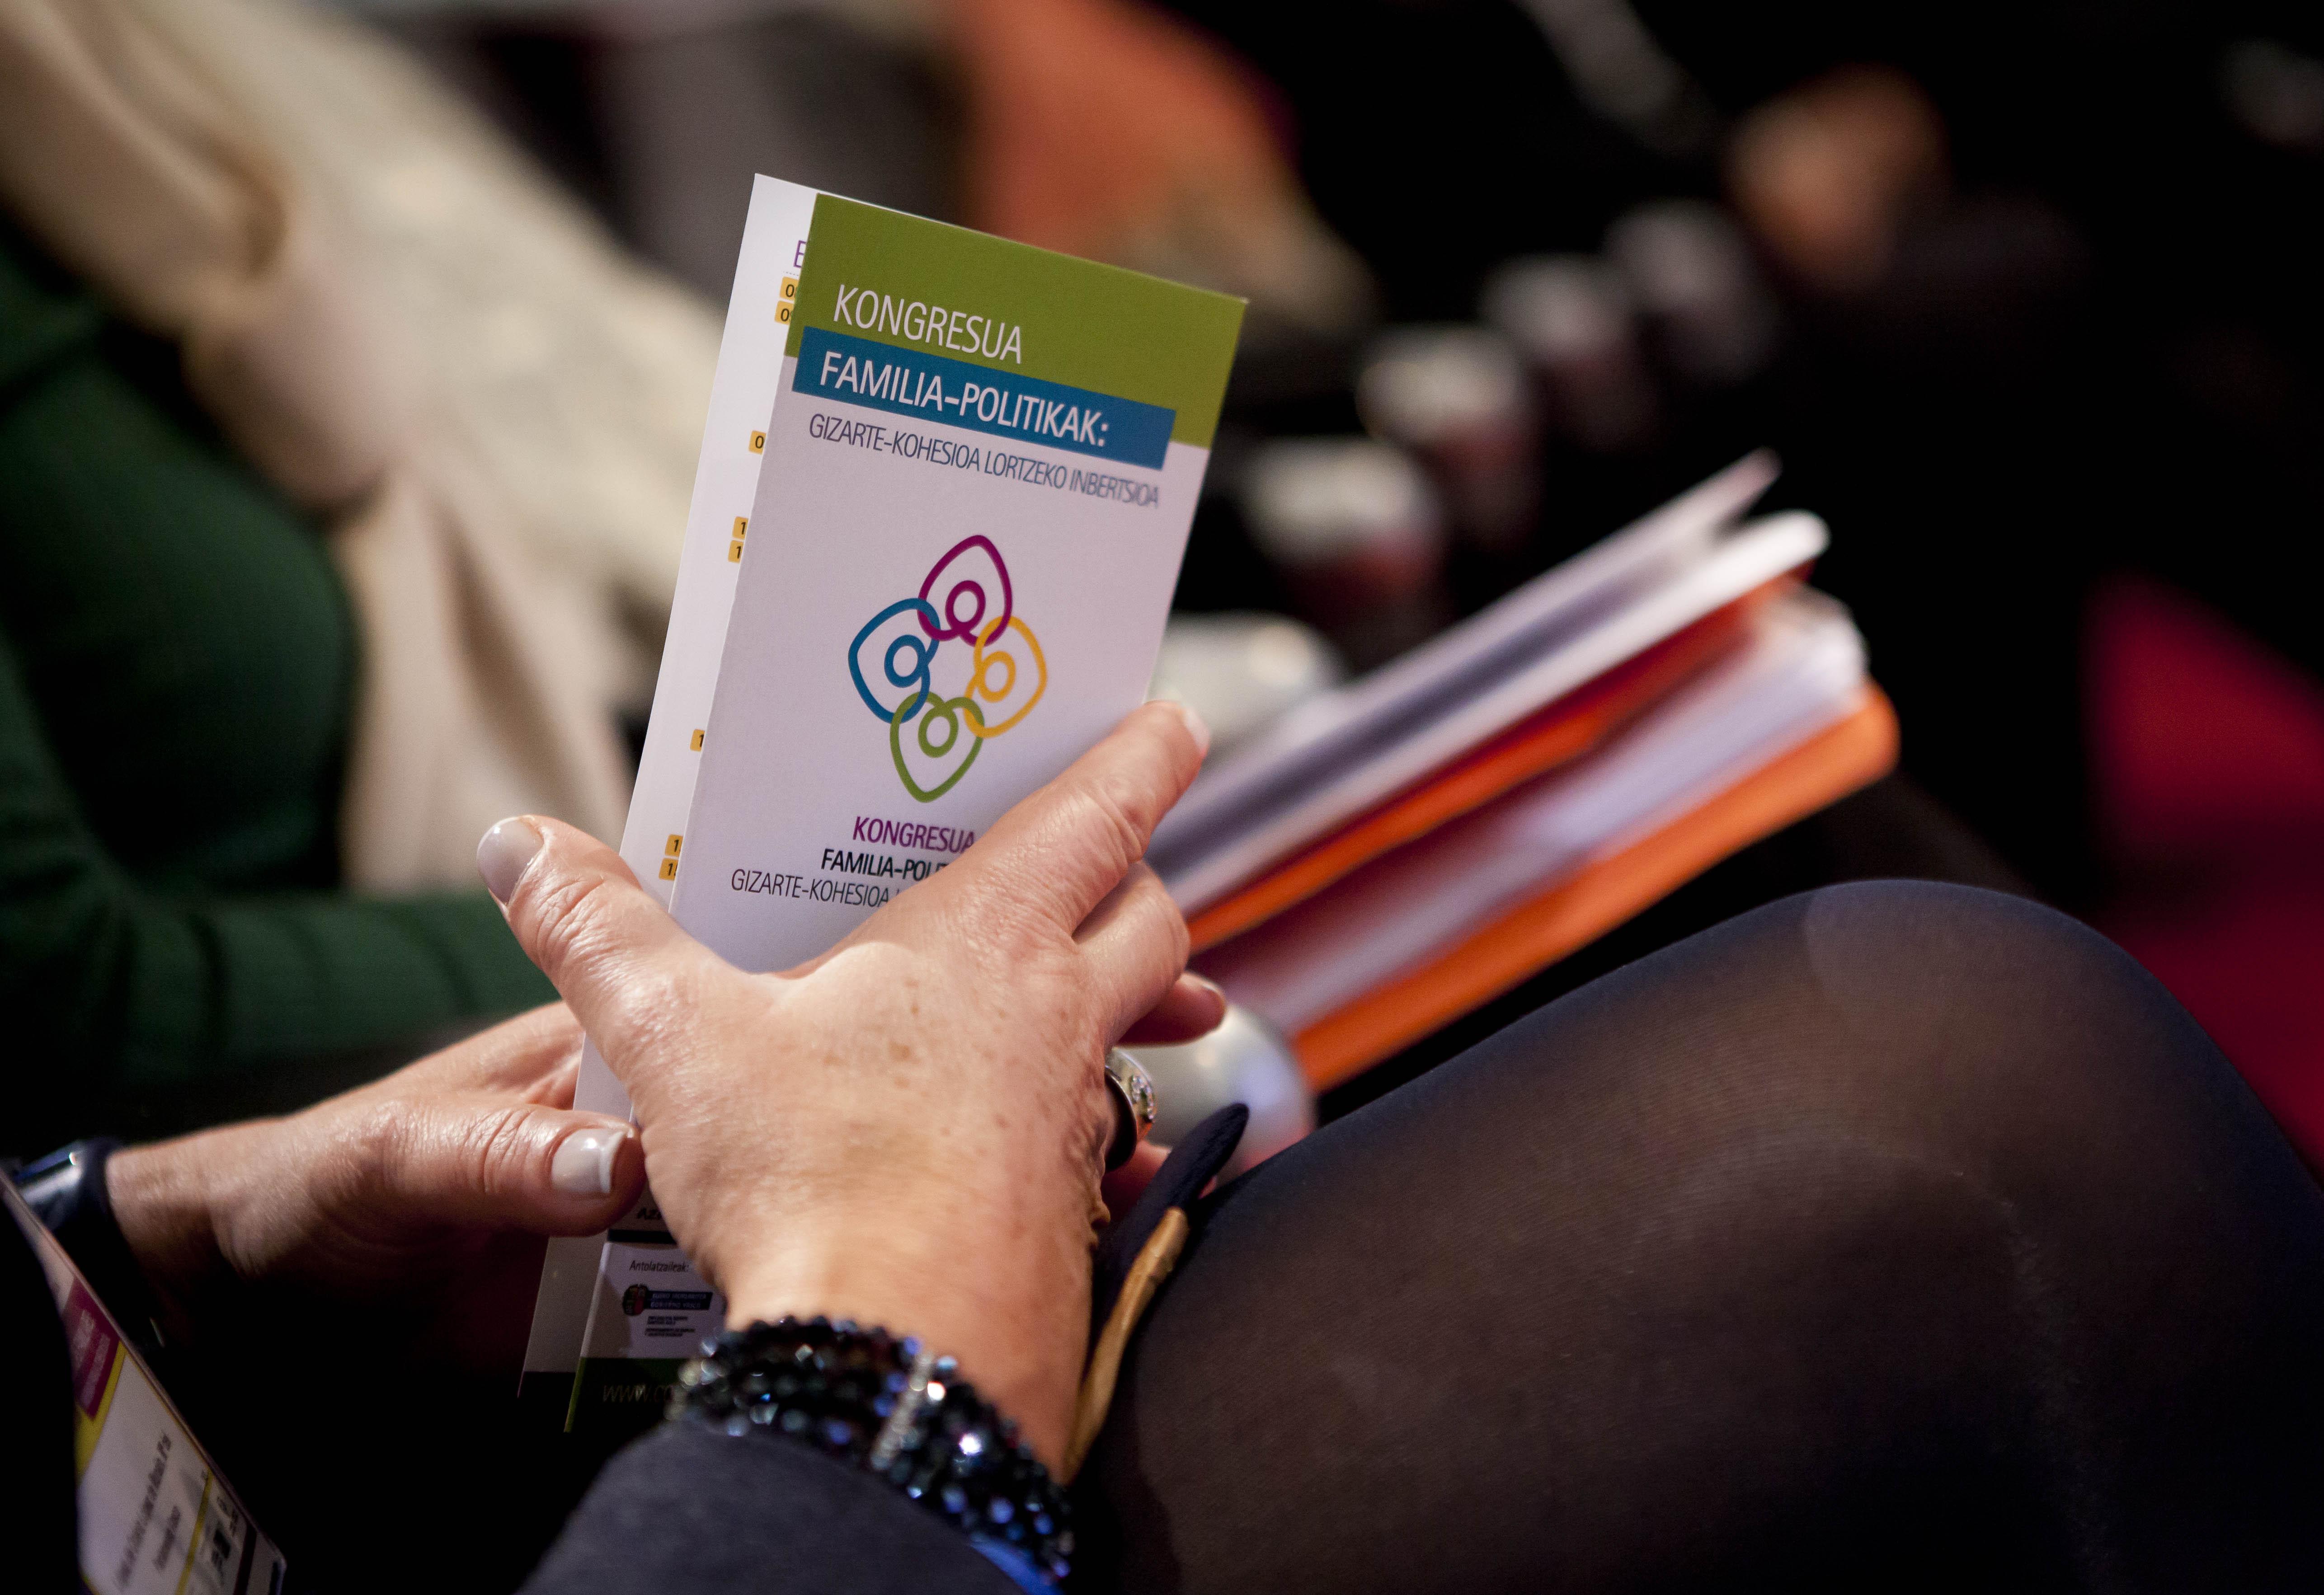 2012_11_06_congreso020.jpg